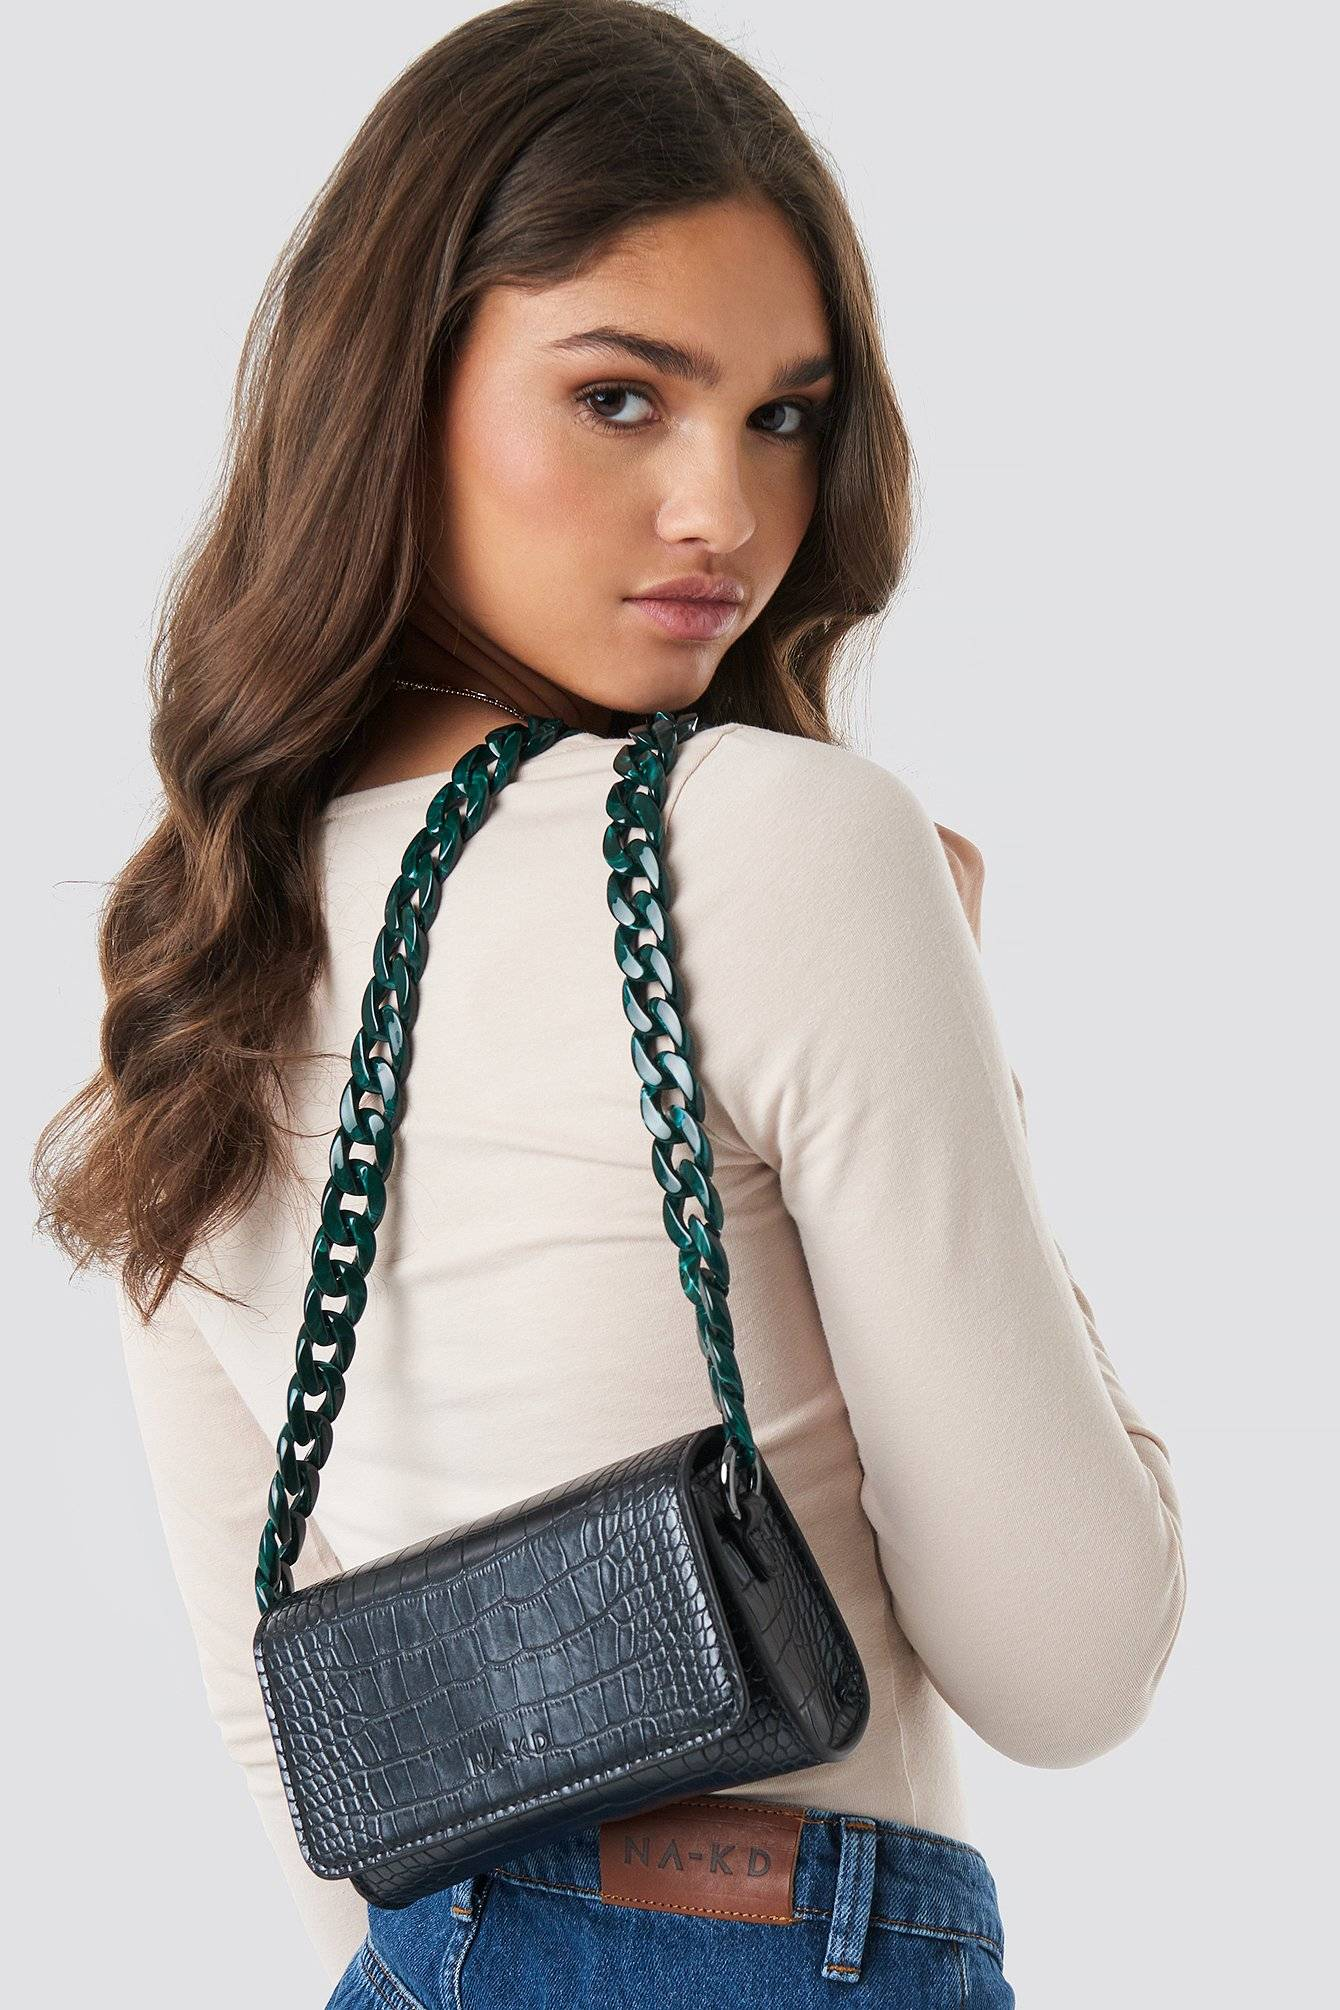 NA-KD Accessories Pop Chain Cross Body Bag - Black